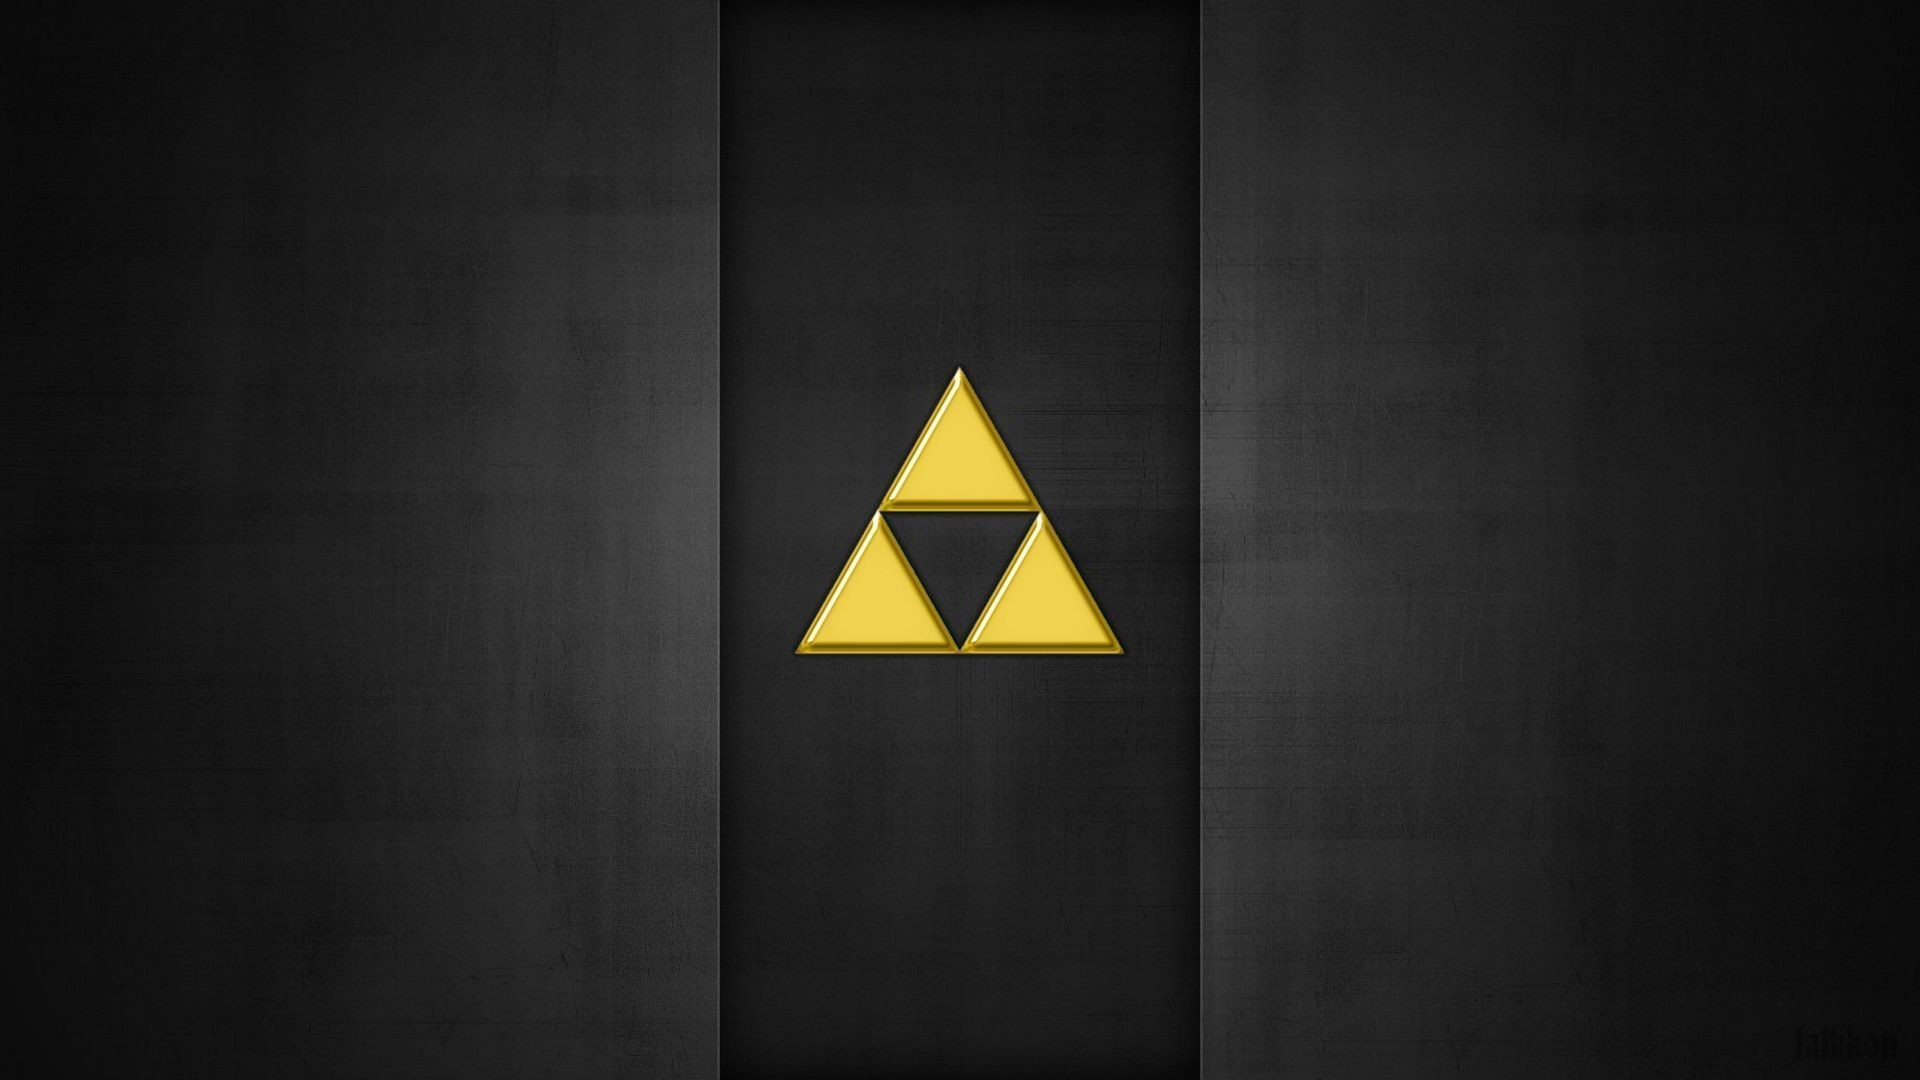 Triforce HD Wallpaper